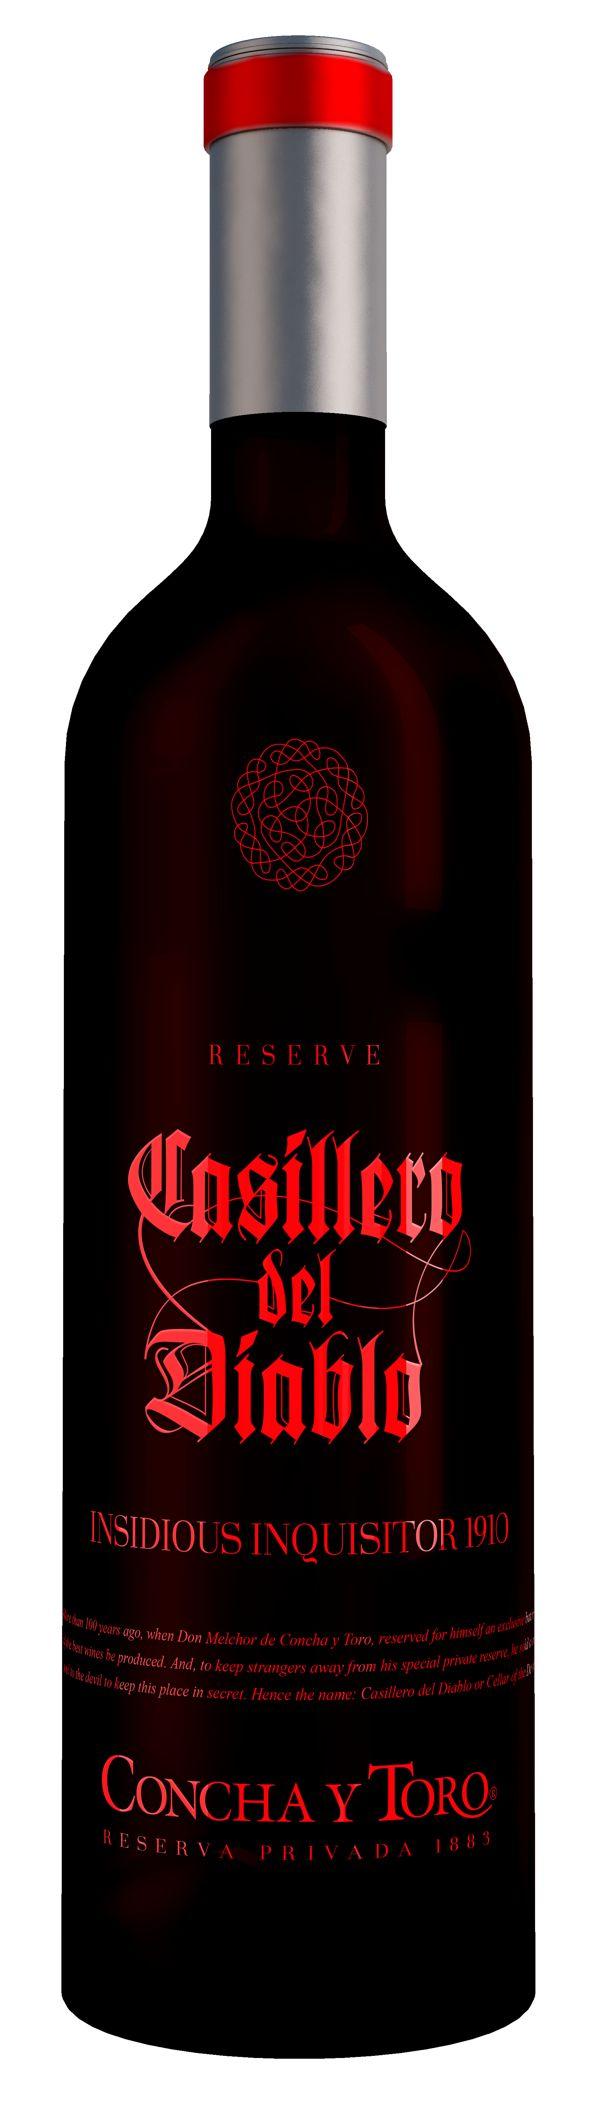 Casillero del Diablo Premium Packaging by Lukasz Kulakowski, via Behance